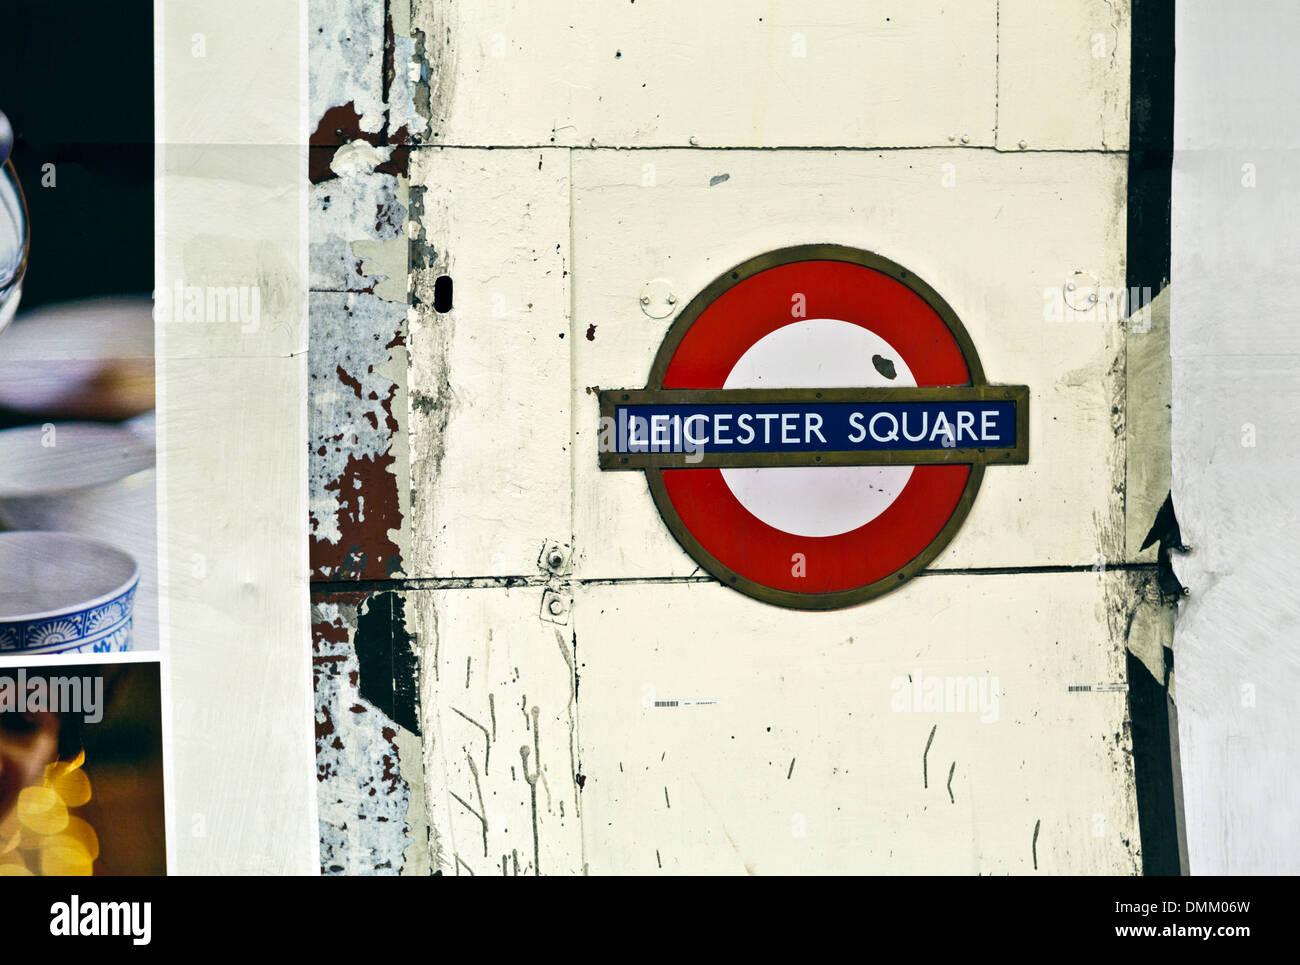 Leicester Square tube station, London Underground, England - Stock Image